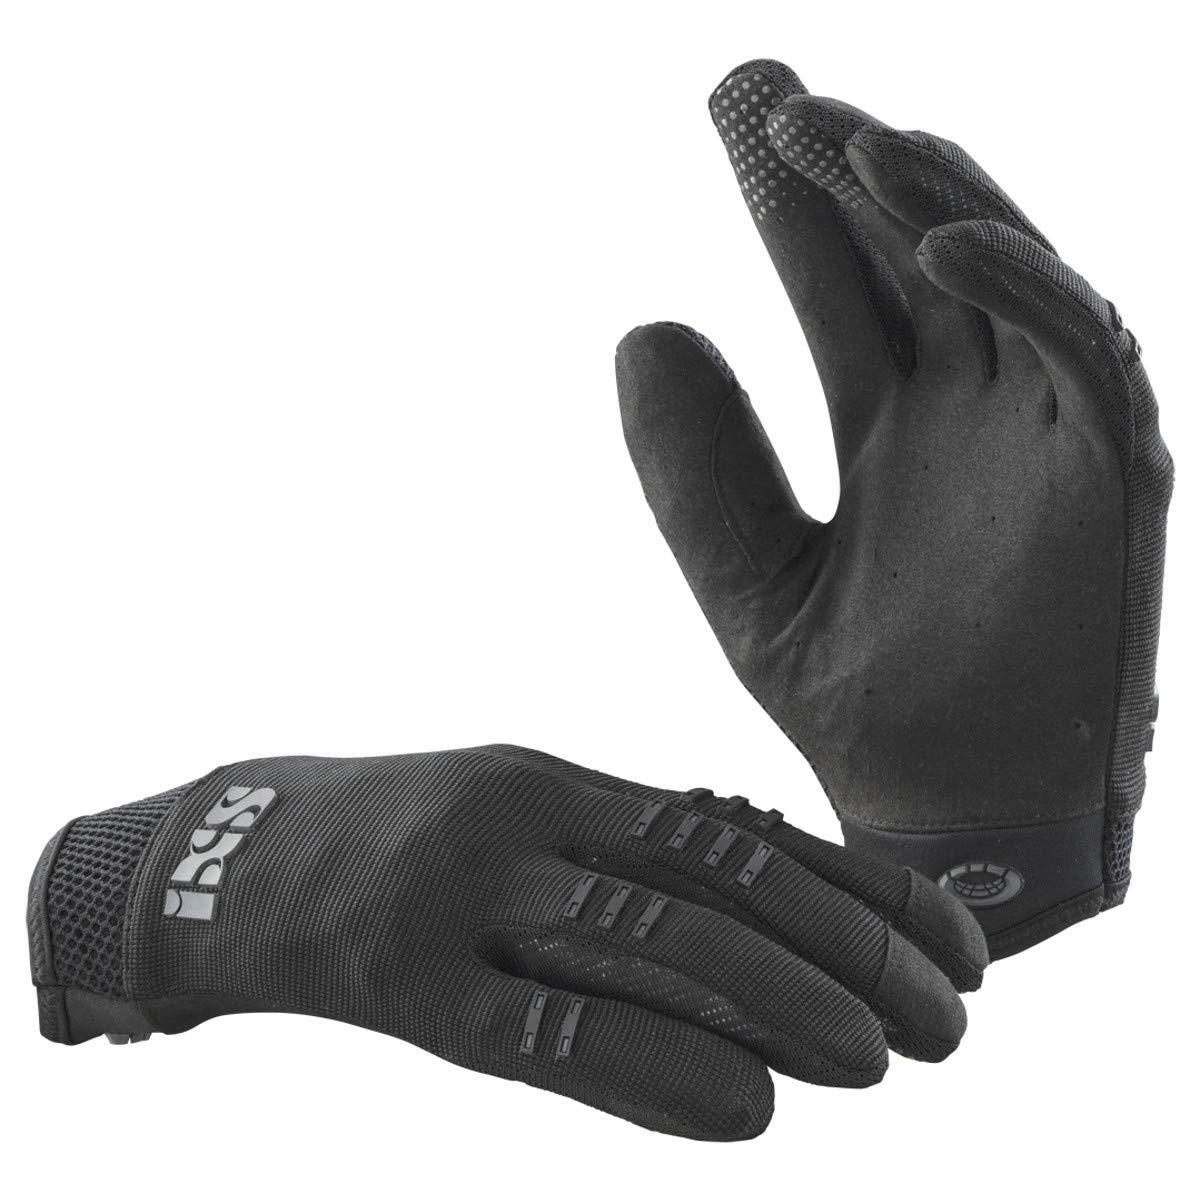 IXS Downhill-Handschuhe BC-X3.1 Schwarz Gr. M